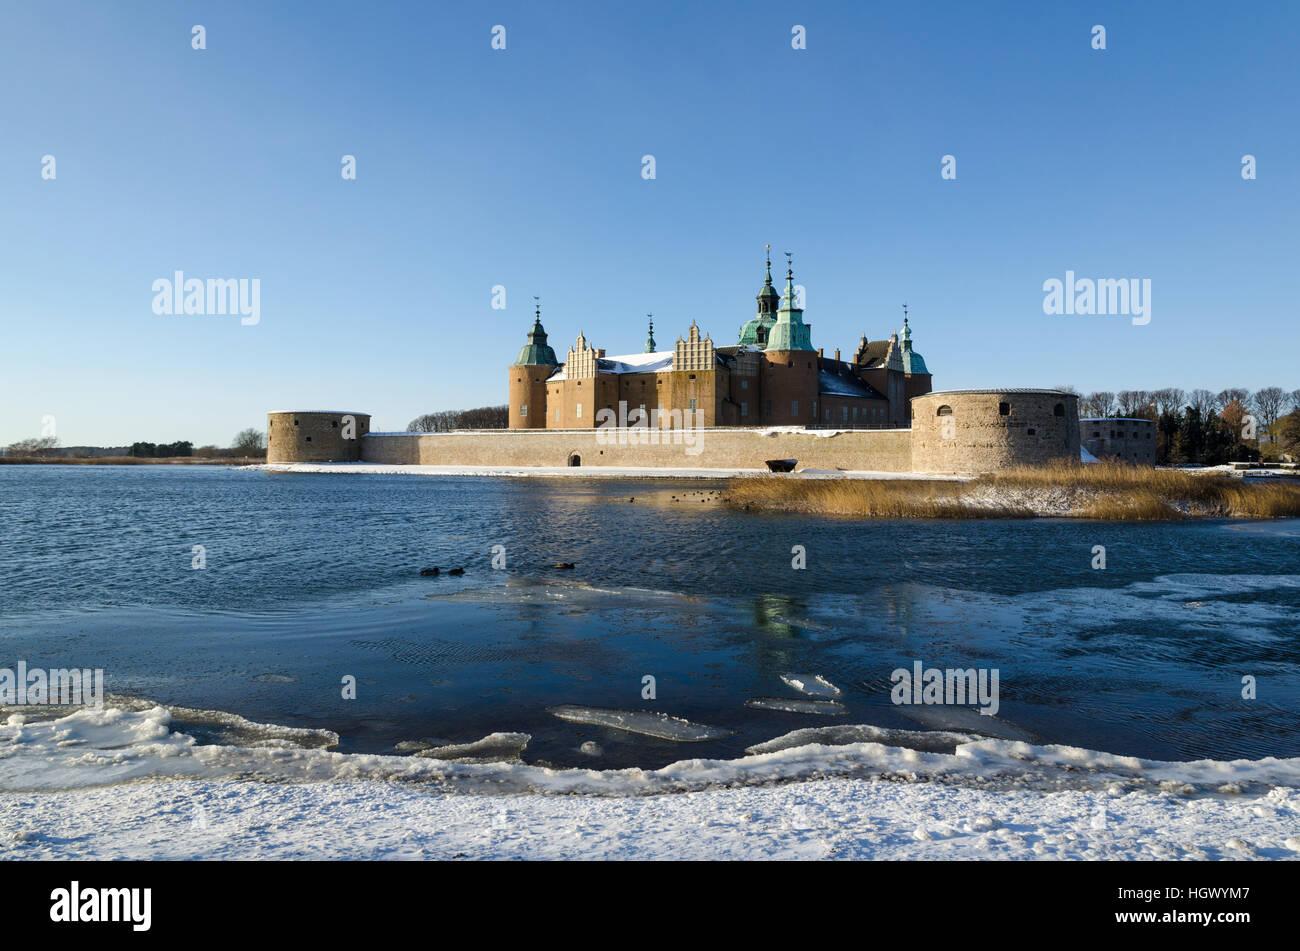 The landmark Kalmar Castle in Sweden by winter season - Stock Image